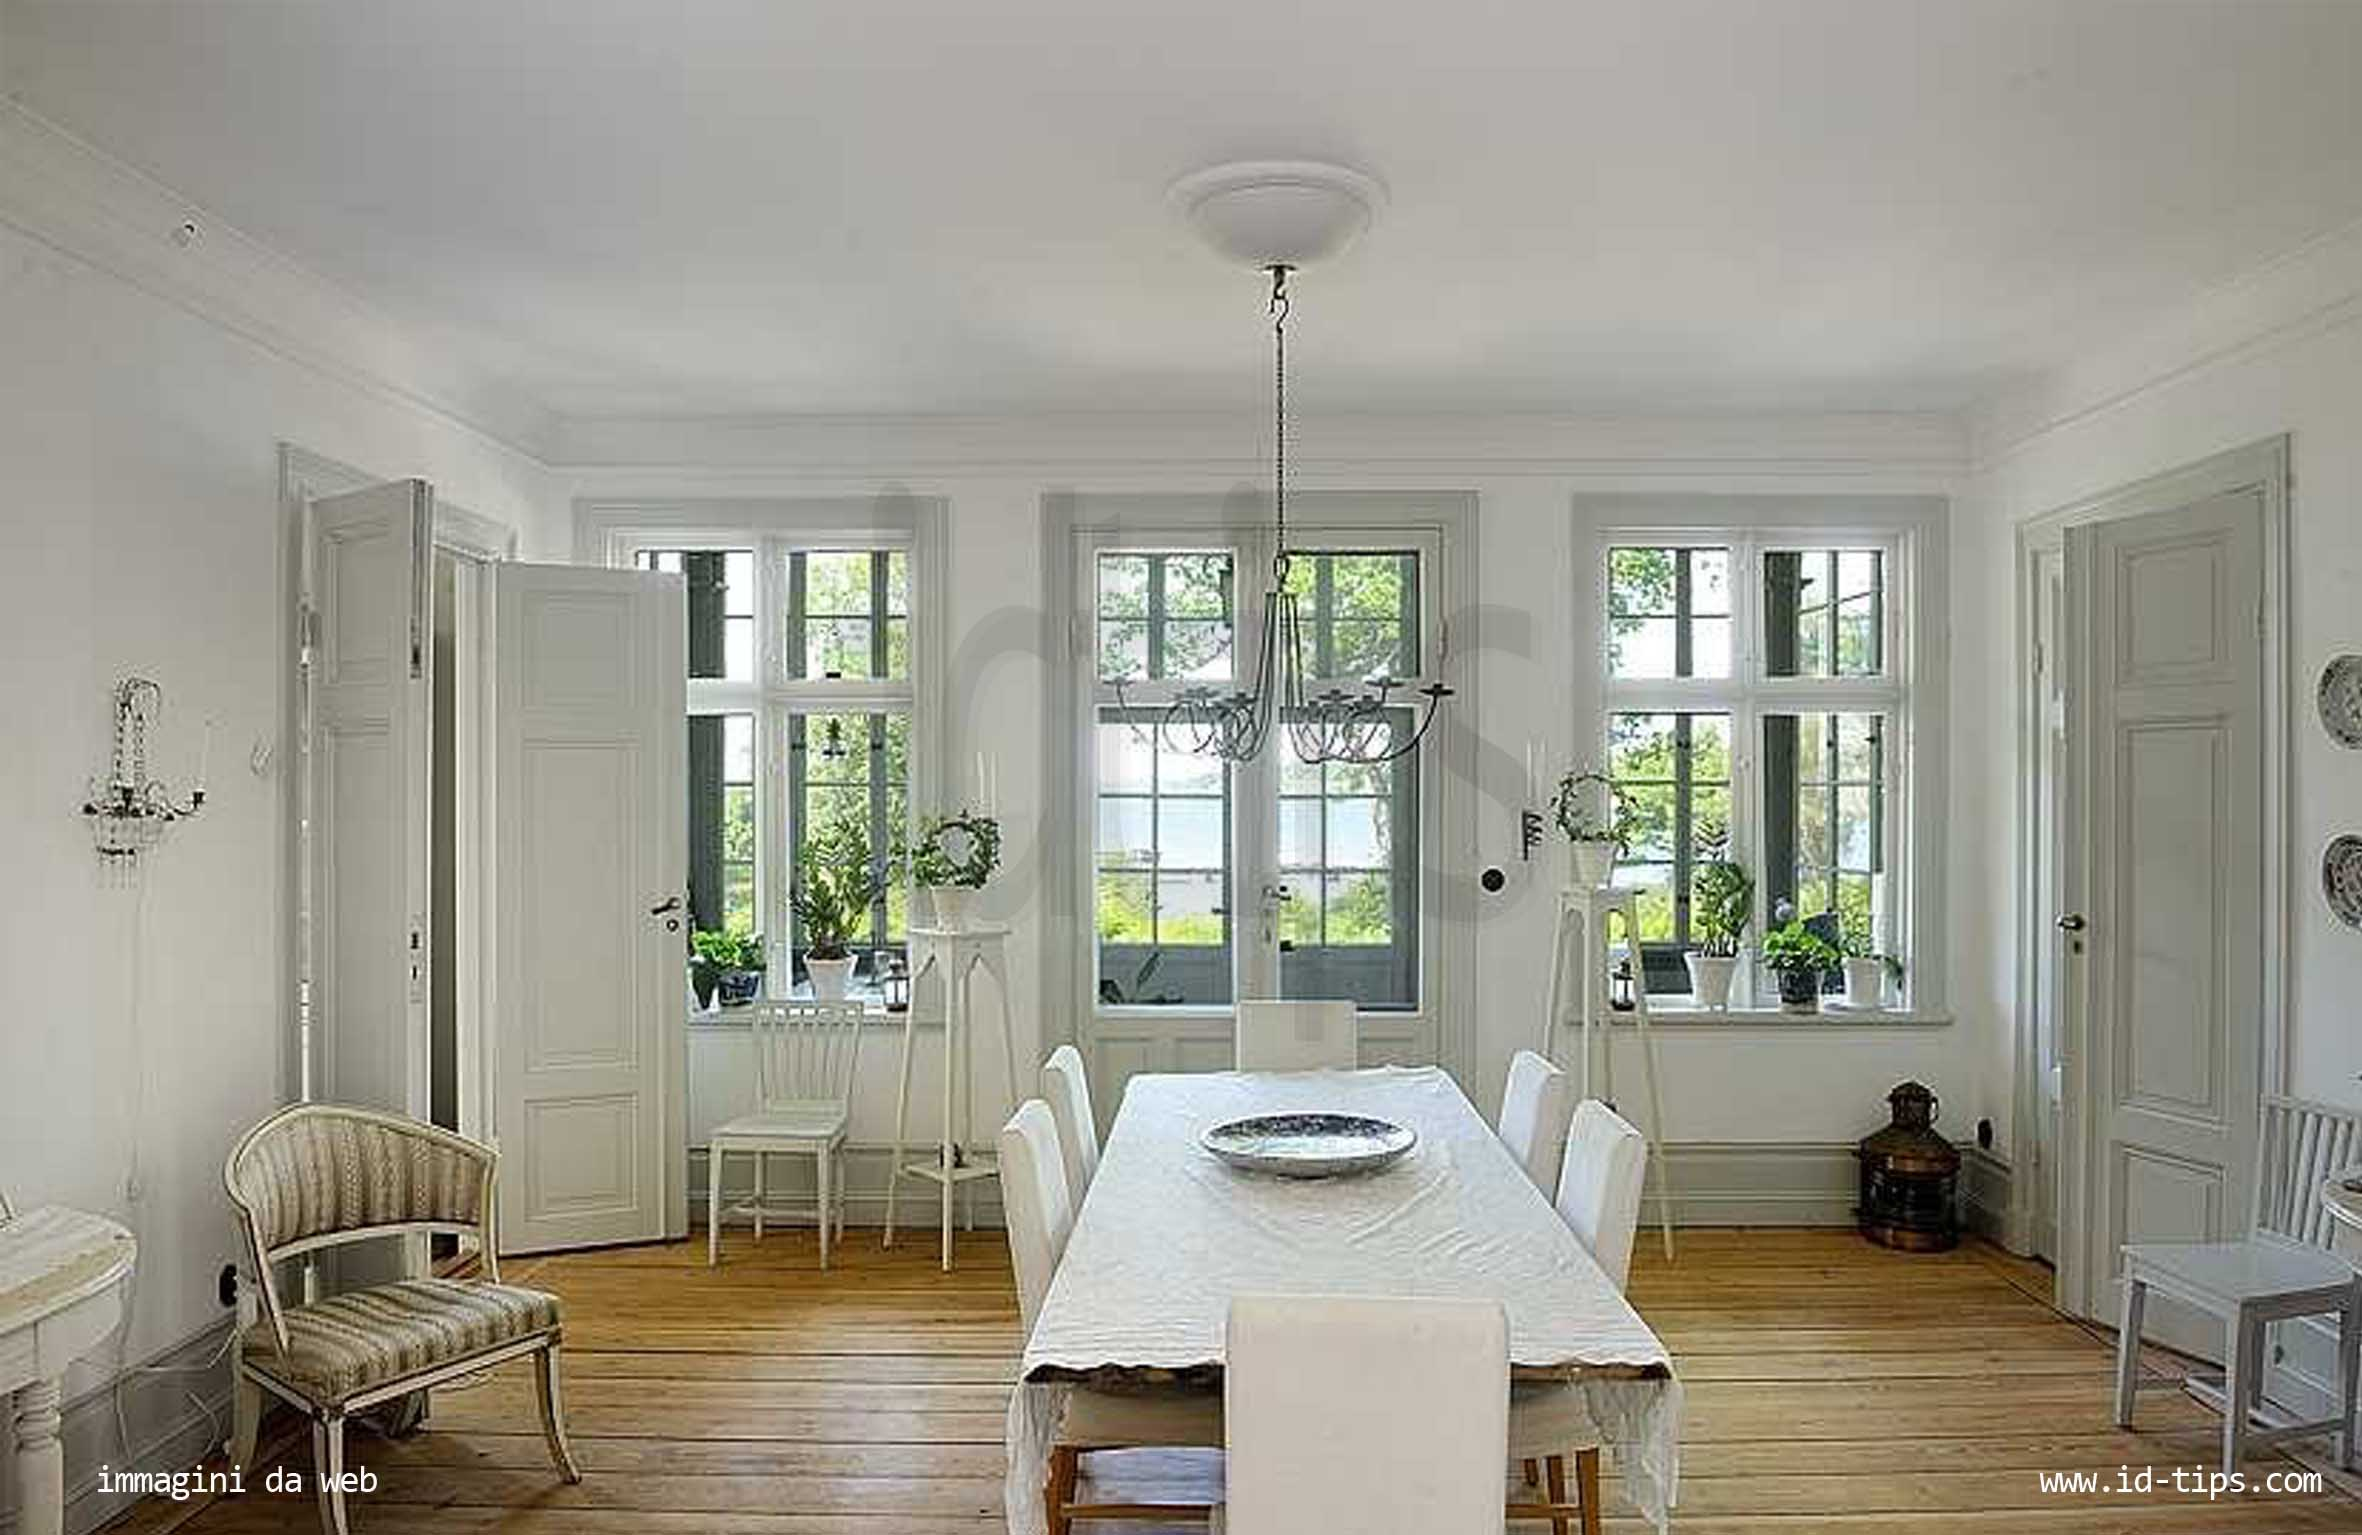 Pittura Pareti Shabby Chic : Colori pareti soggiorno shabby chic colori cucina pareti